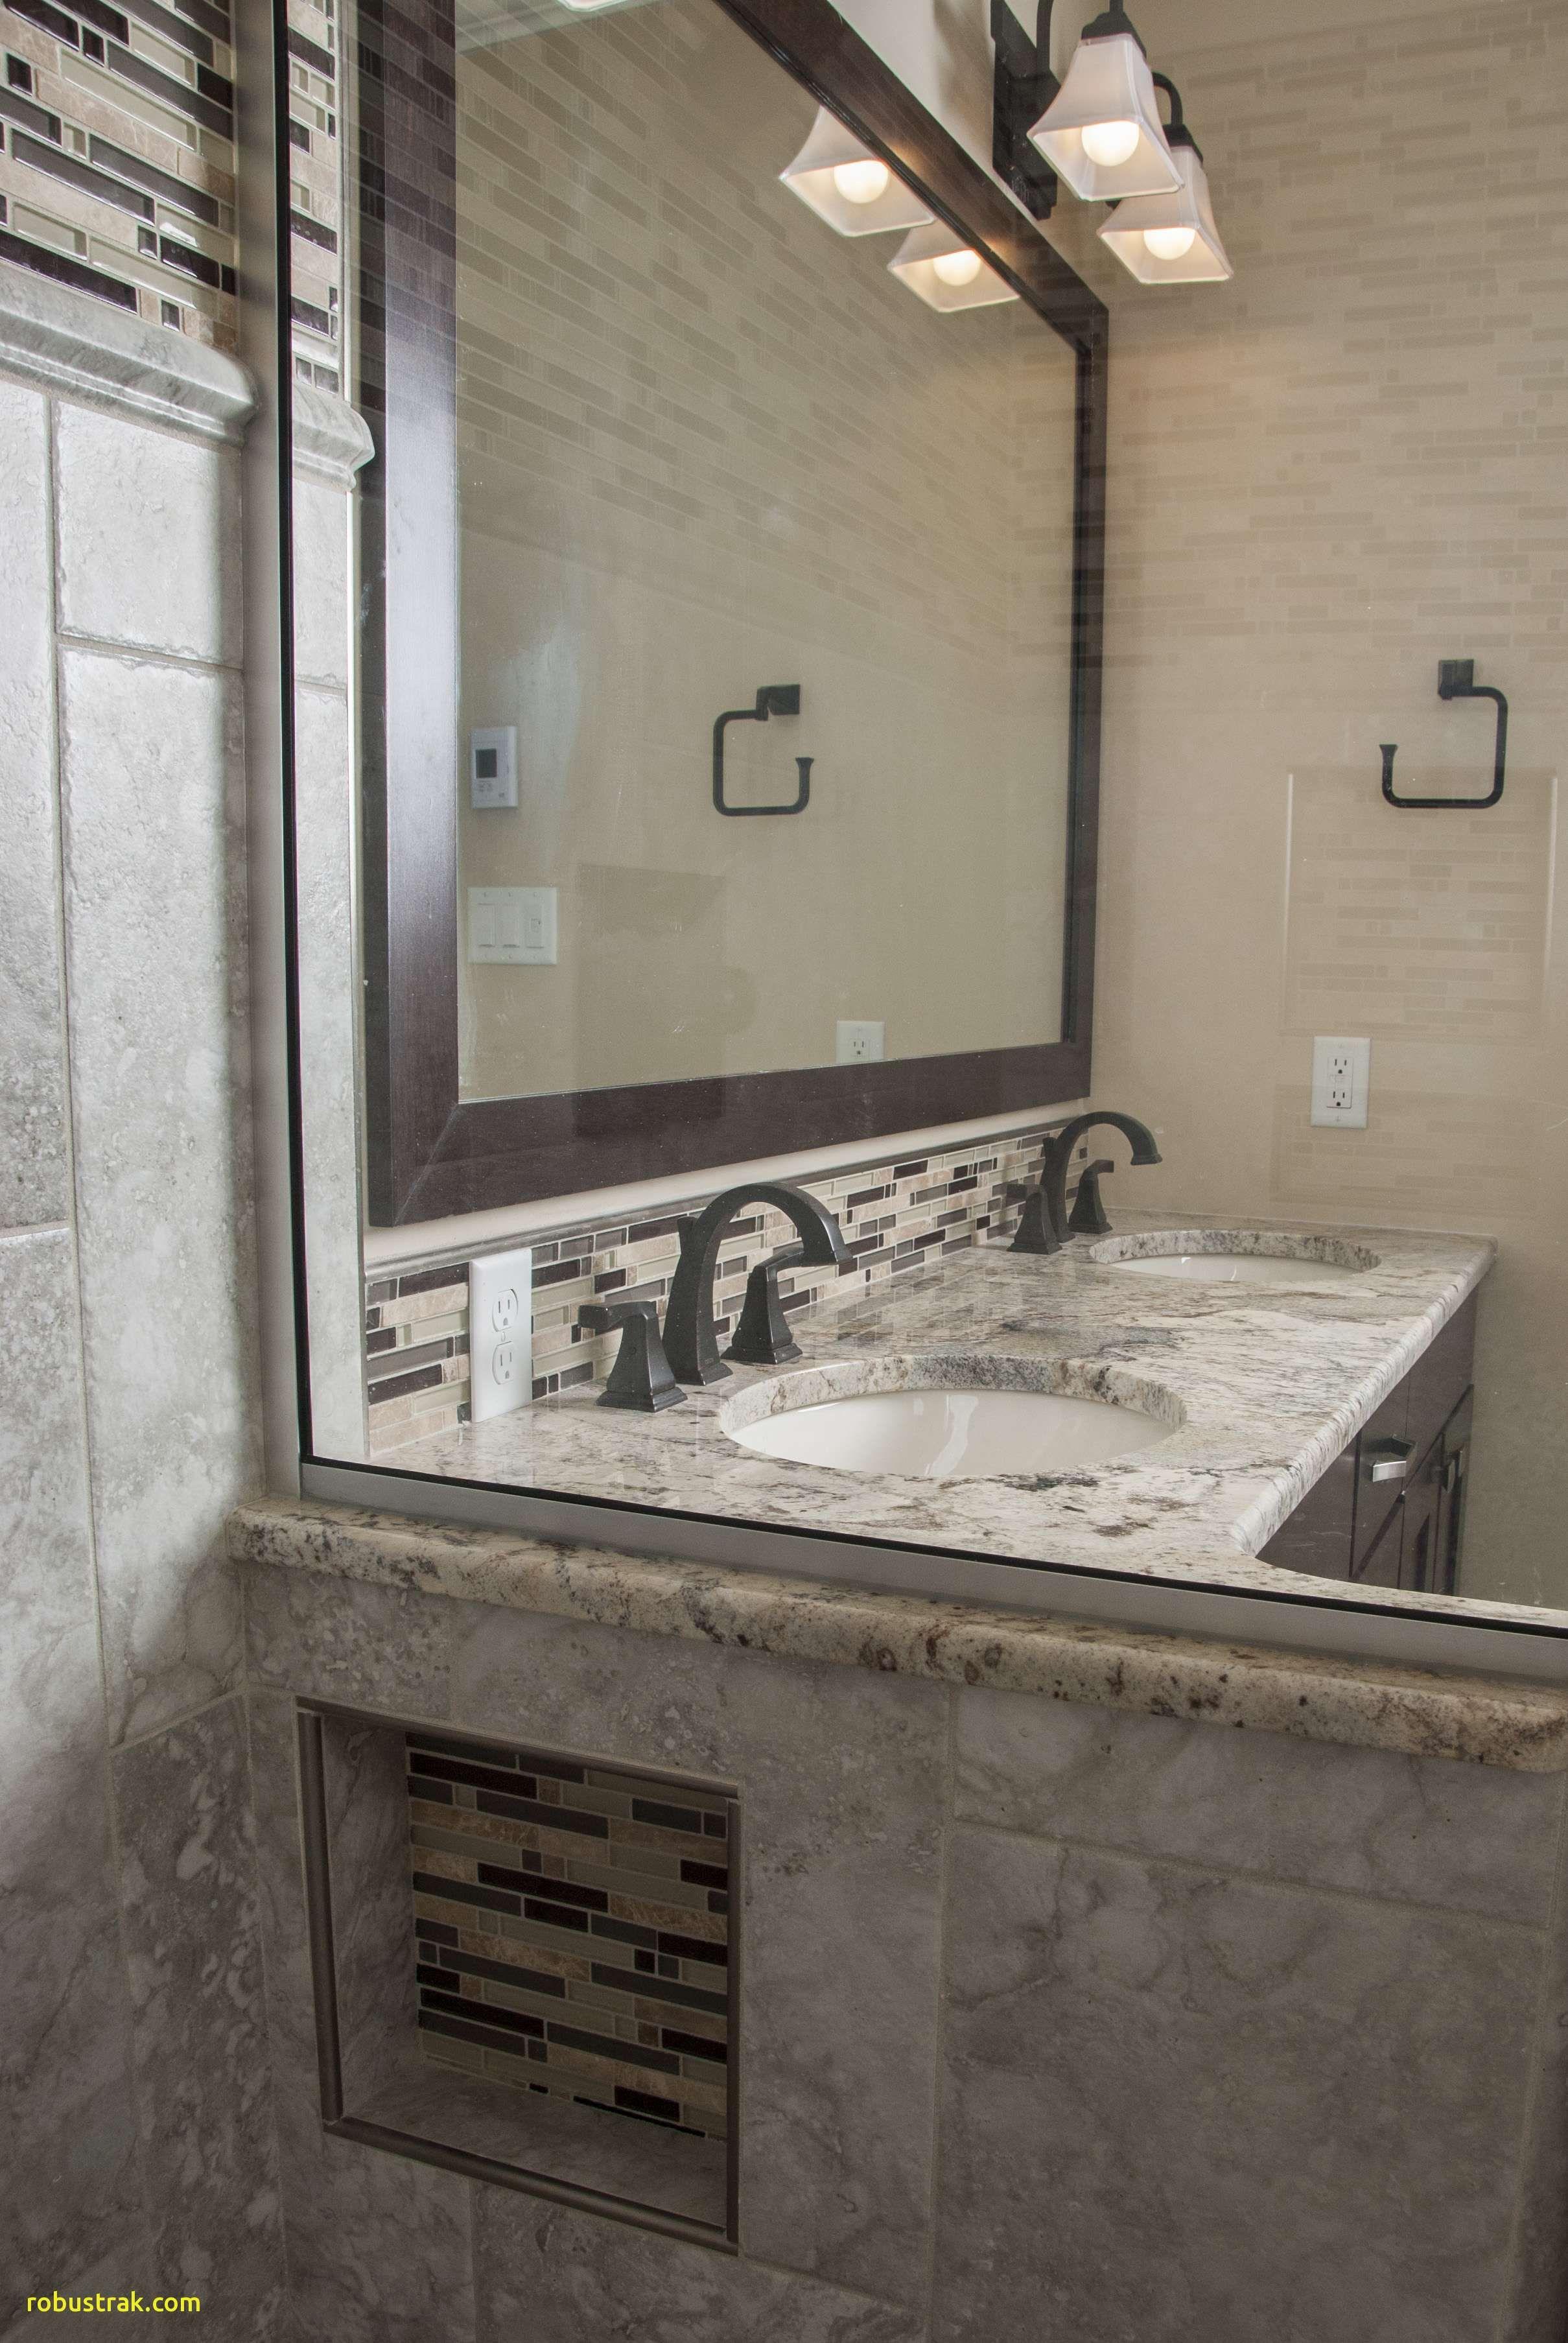 Inspirational Oil Rubbed Bronze Bathroom Mirror Home Design Ideas Bathroom Mirror Bronze Bathroom Custom Bathroom Vanity